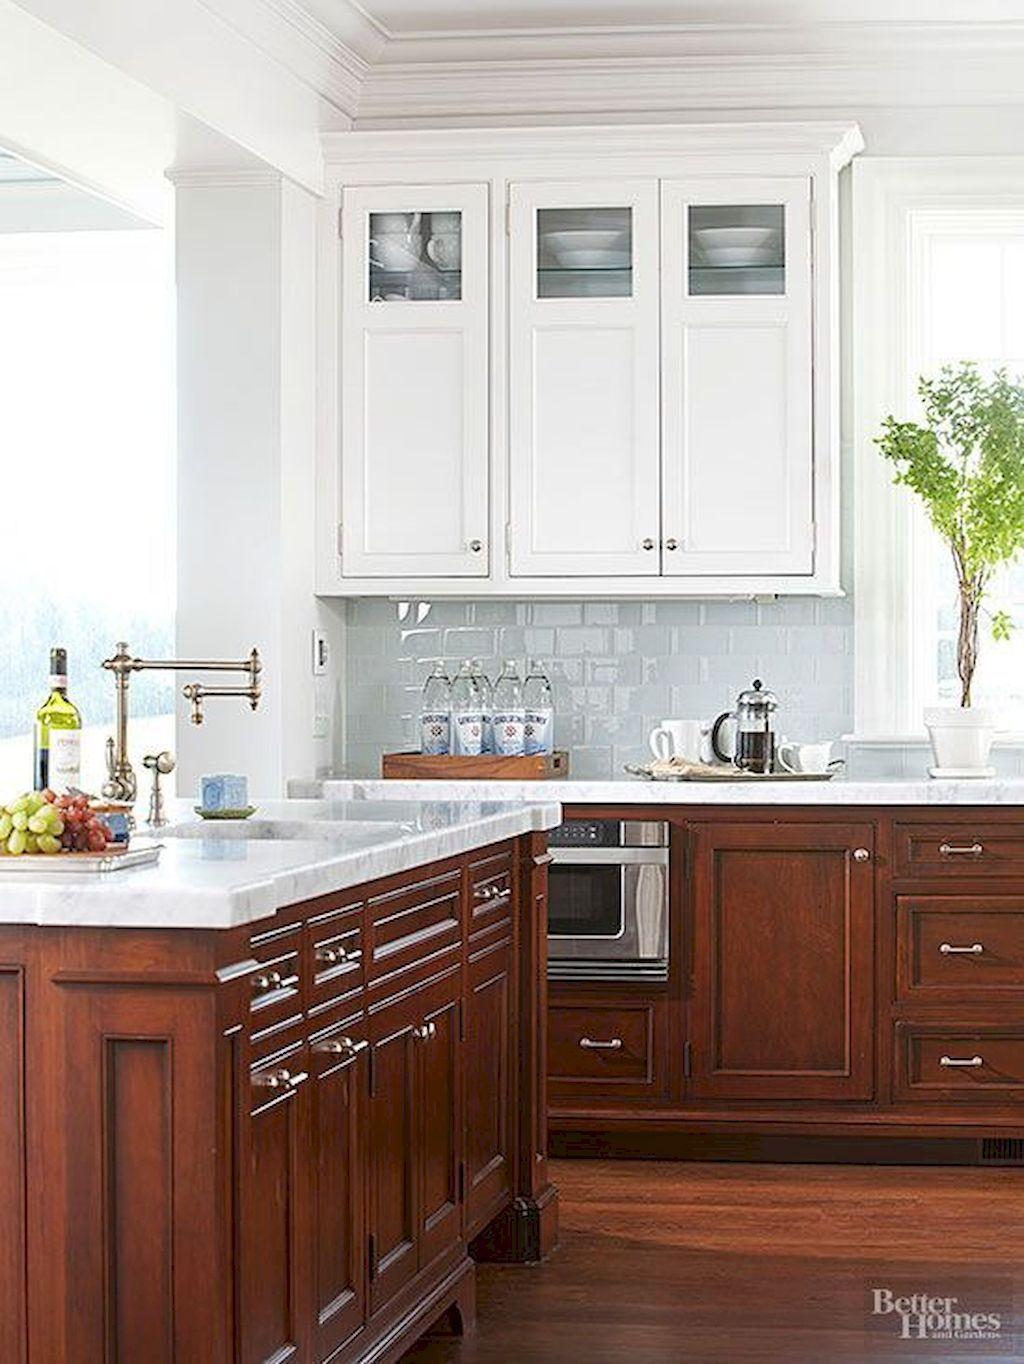 100 supreme oak kitchen cabinets ideas decoration for farmhouse rh in pinterest com